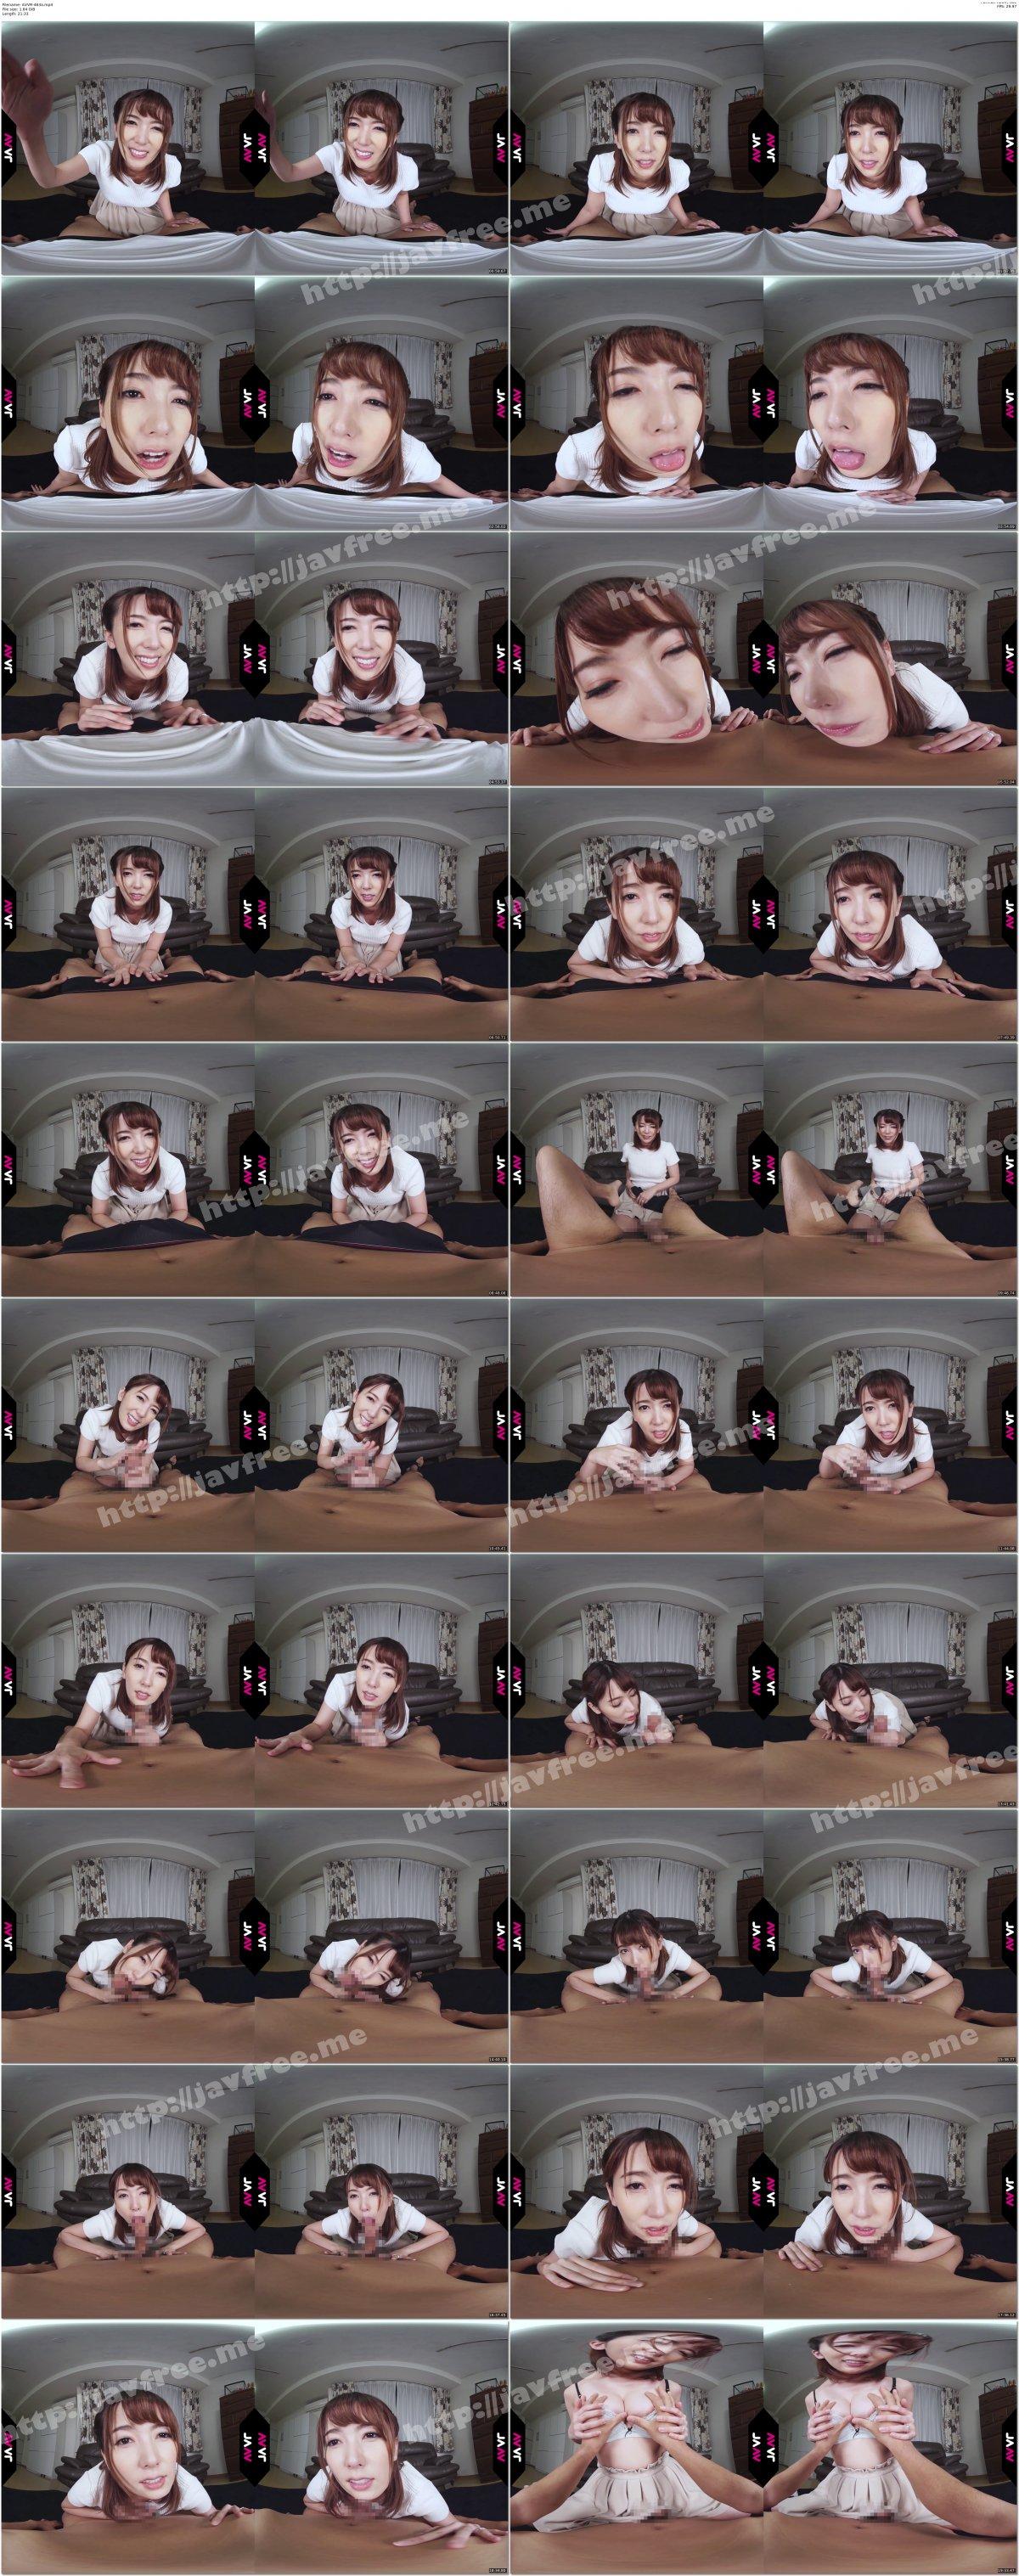 [AVVR-463] 【VR】義理の母・波多野結衣。忙しい父の代わりに僕とラブラブ中出しセックス!! 波多野結衣 - image AVVR-463a on https://javfree.me